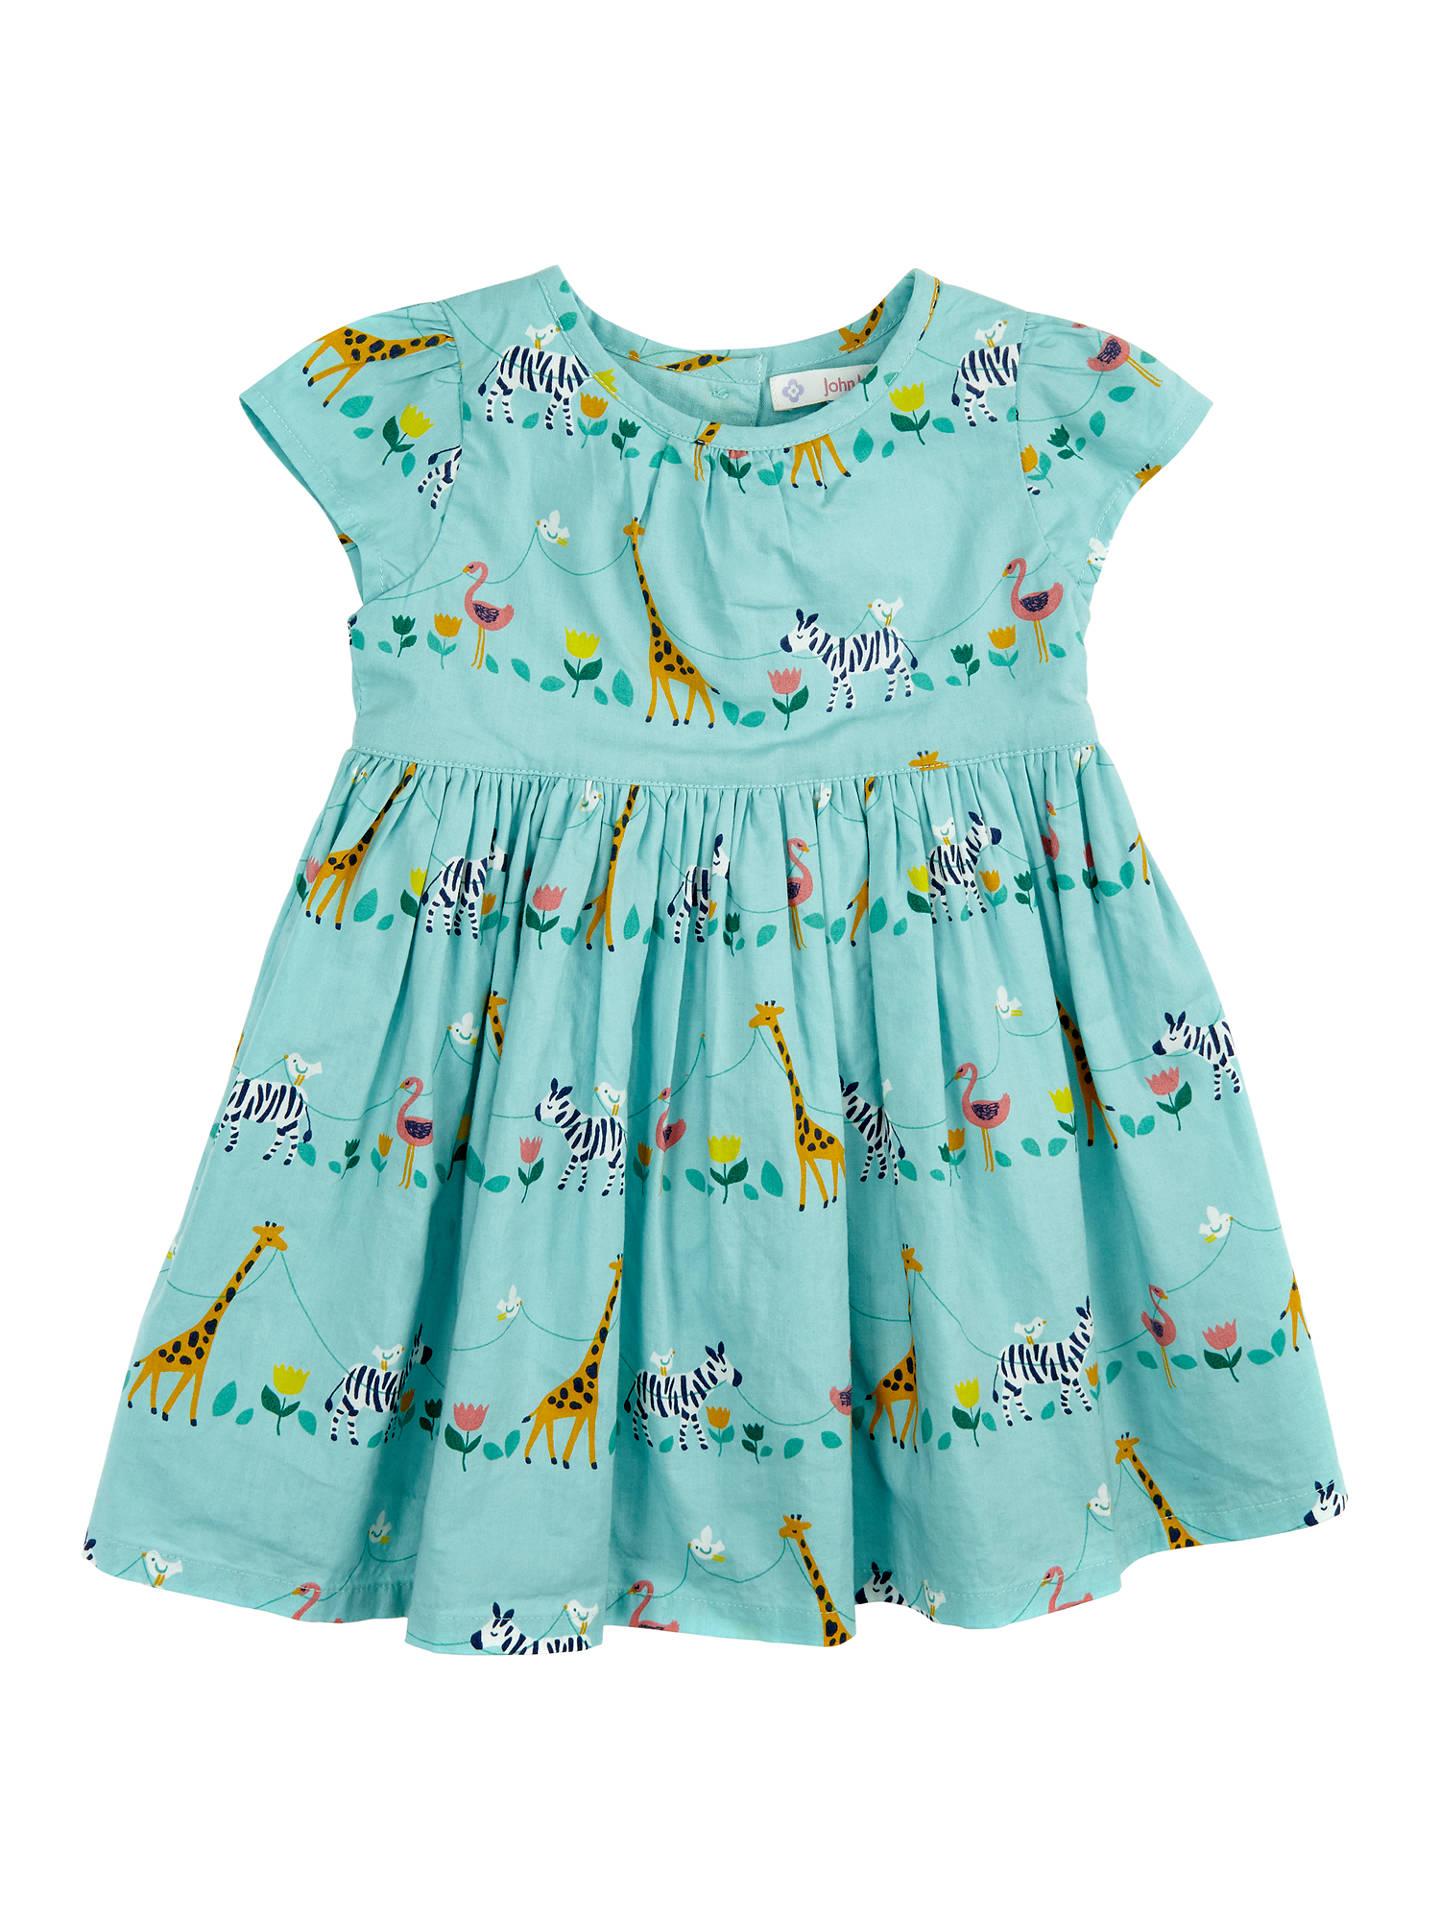 97cdf4adbaf4 John Lewis Baby Safari Animals Print Dress